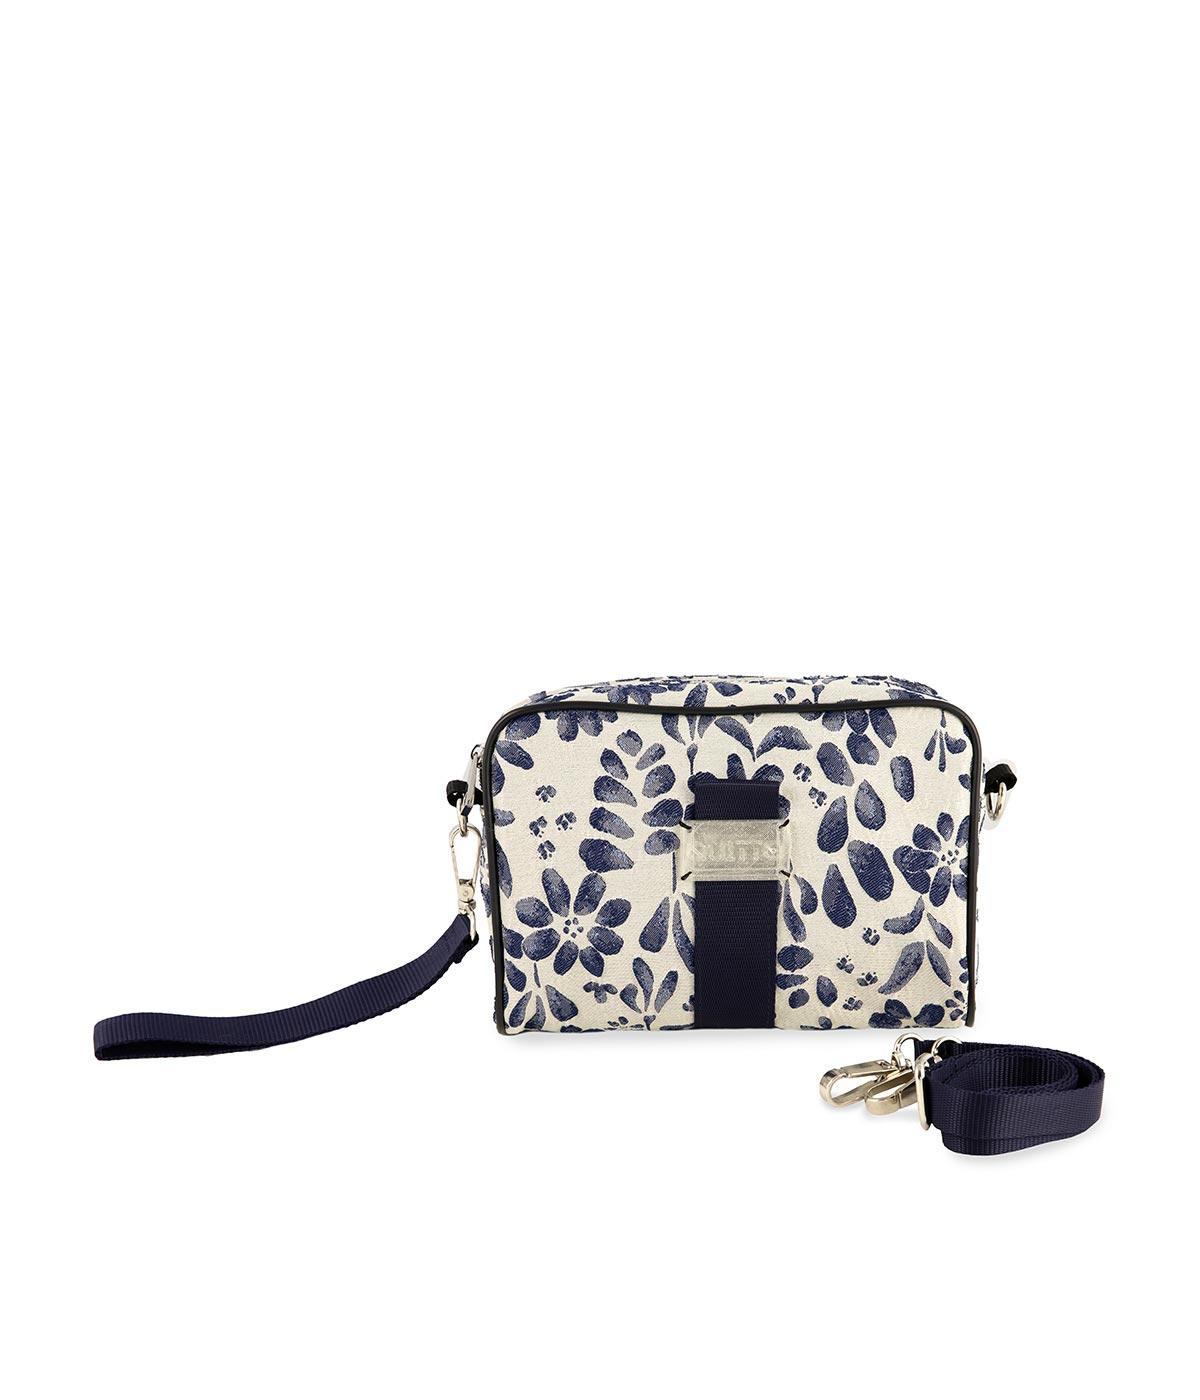 Beauty Bag Tessuto Damascato Quitto Bagsle-bianco-blu-fascia-blu-fronte